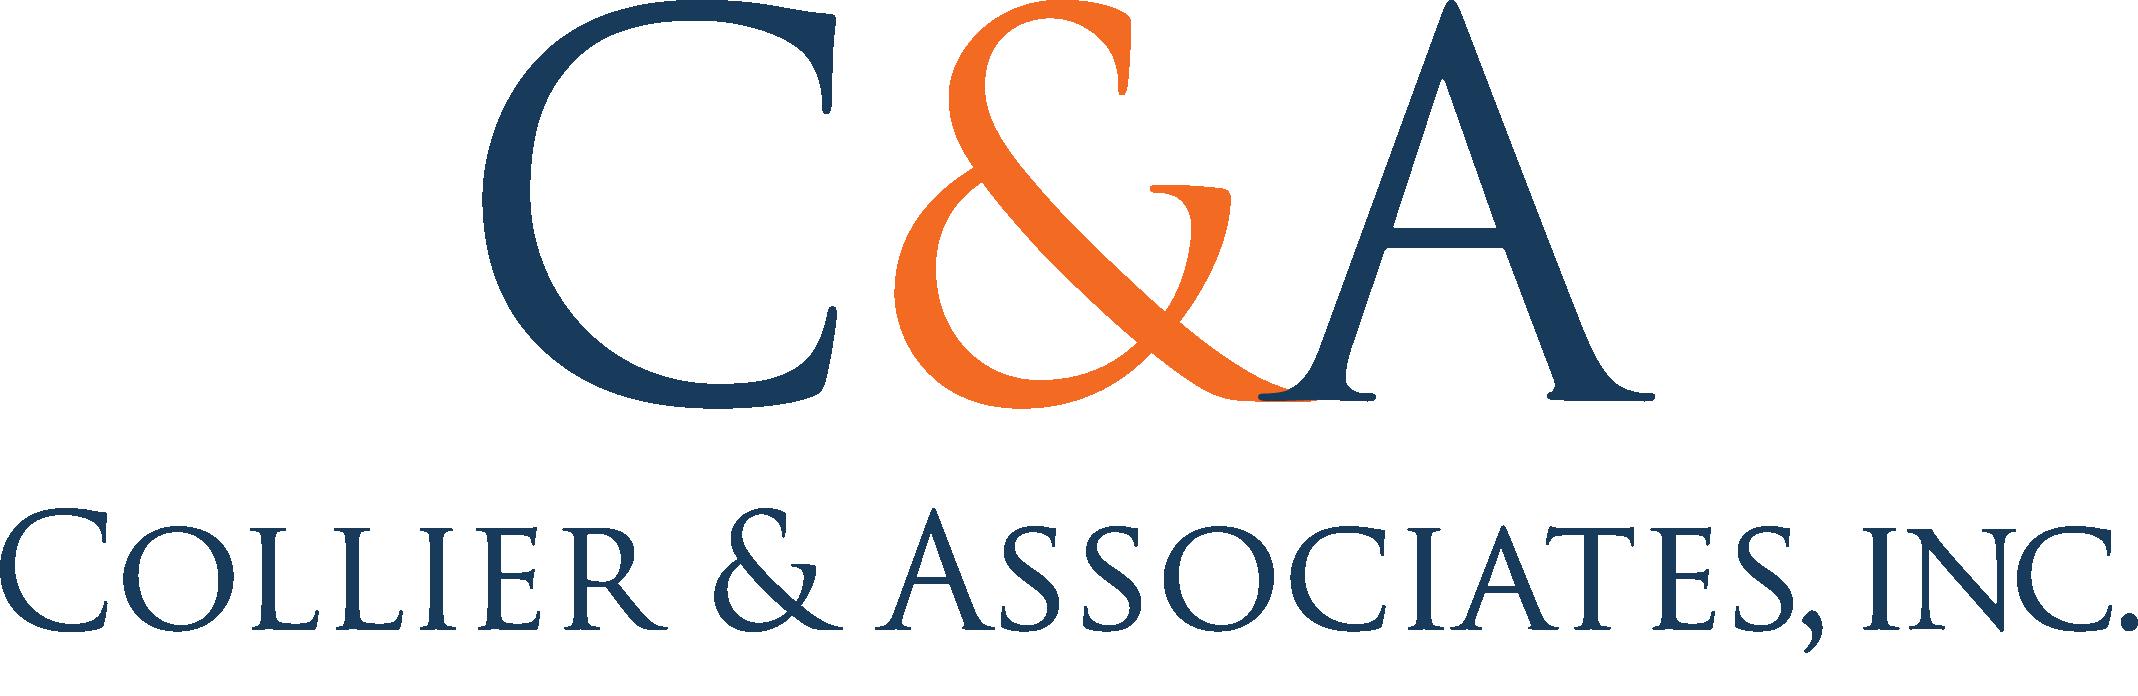 Collier & Associates Membership